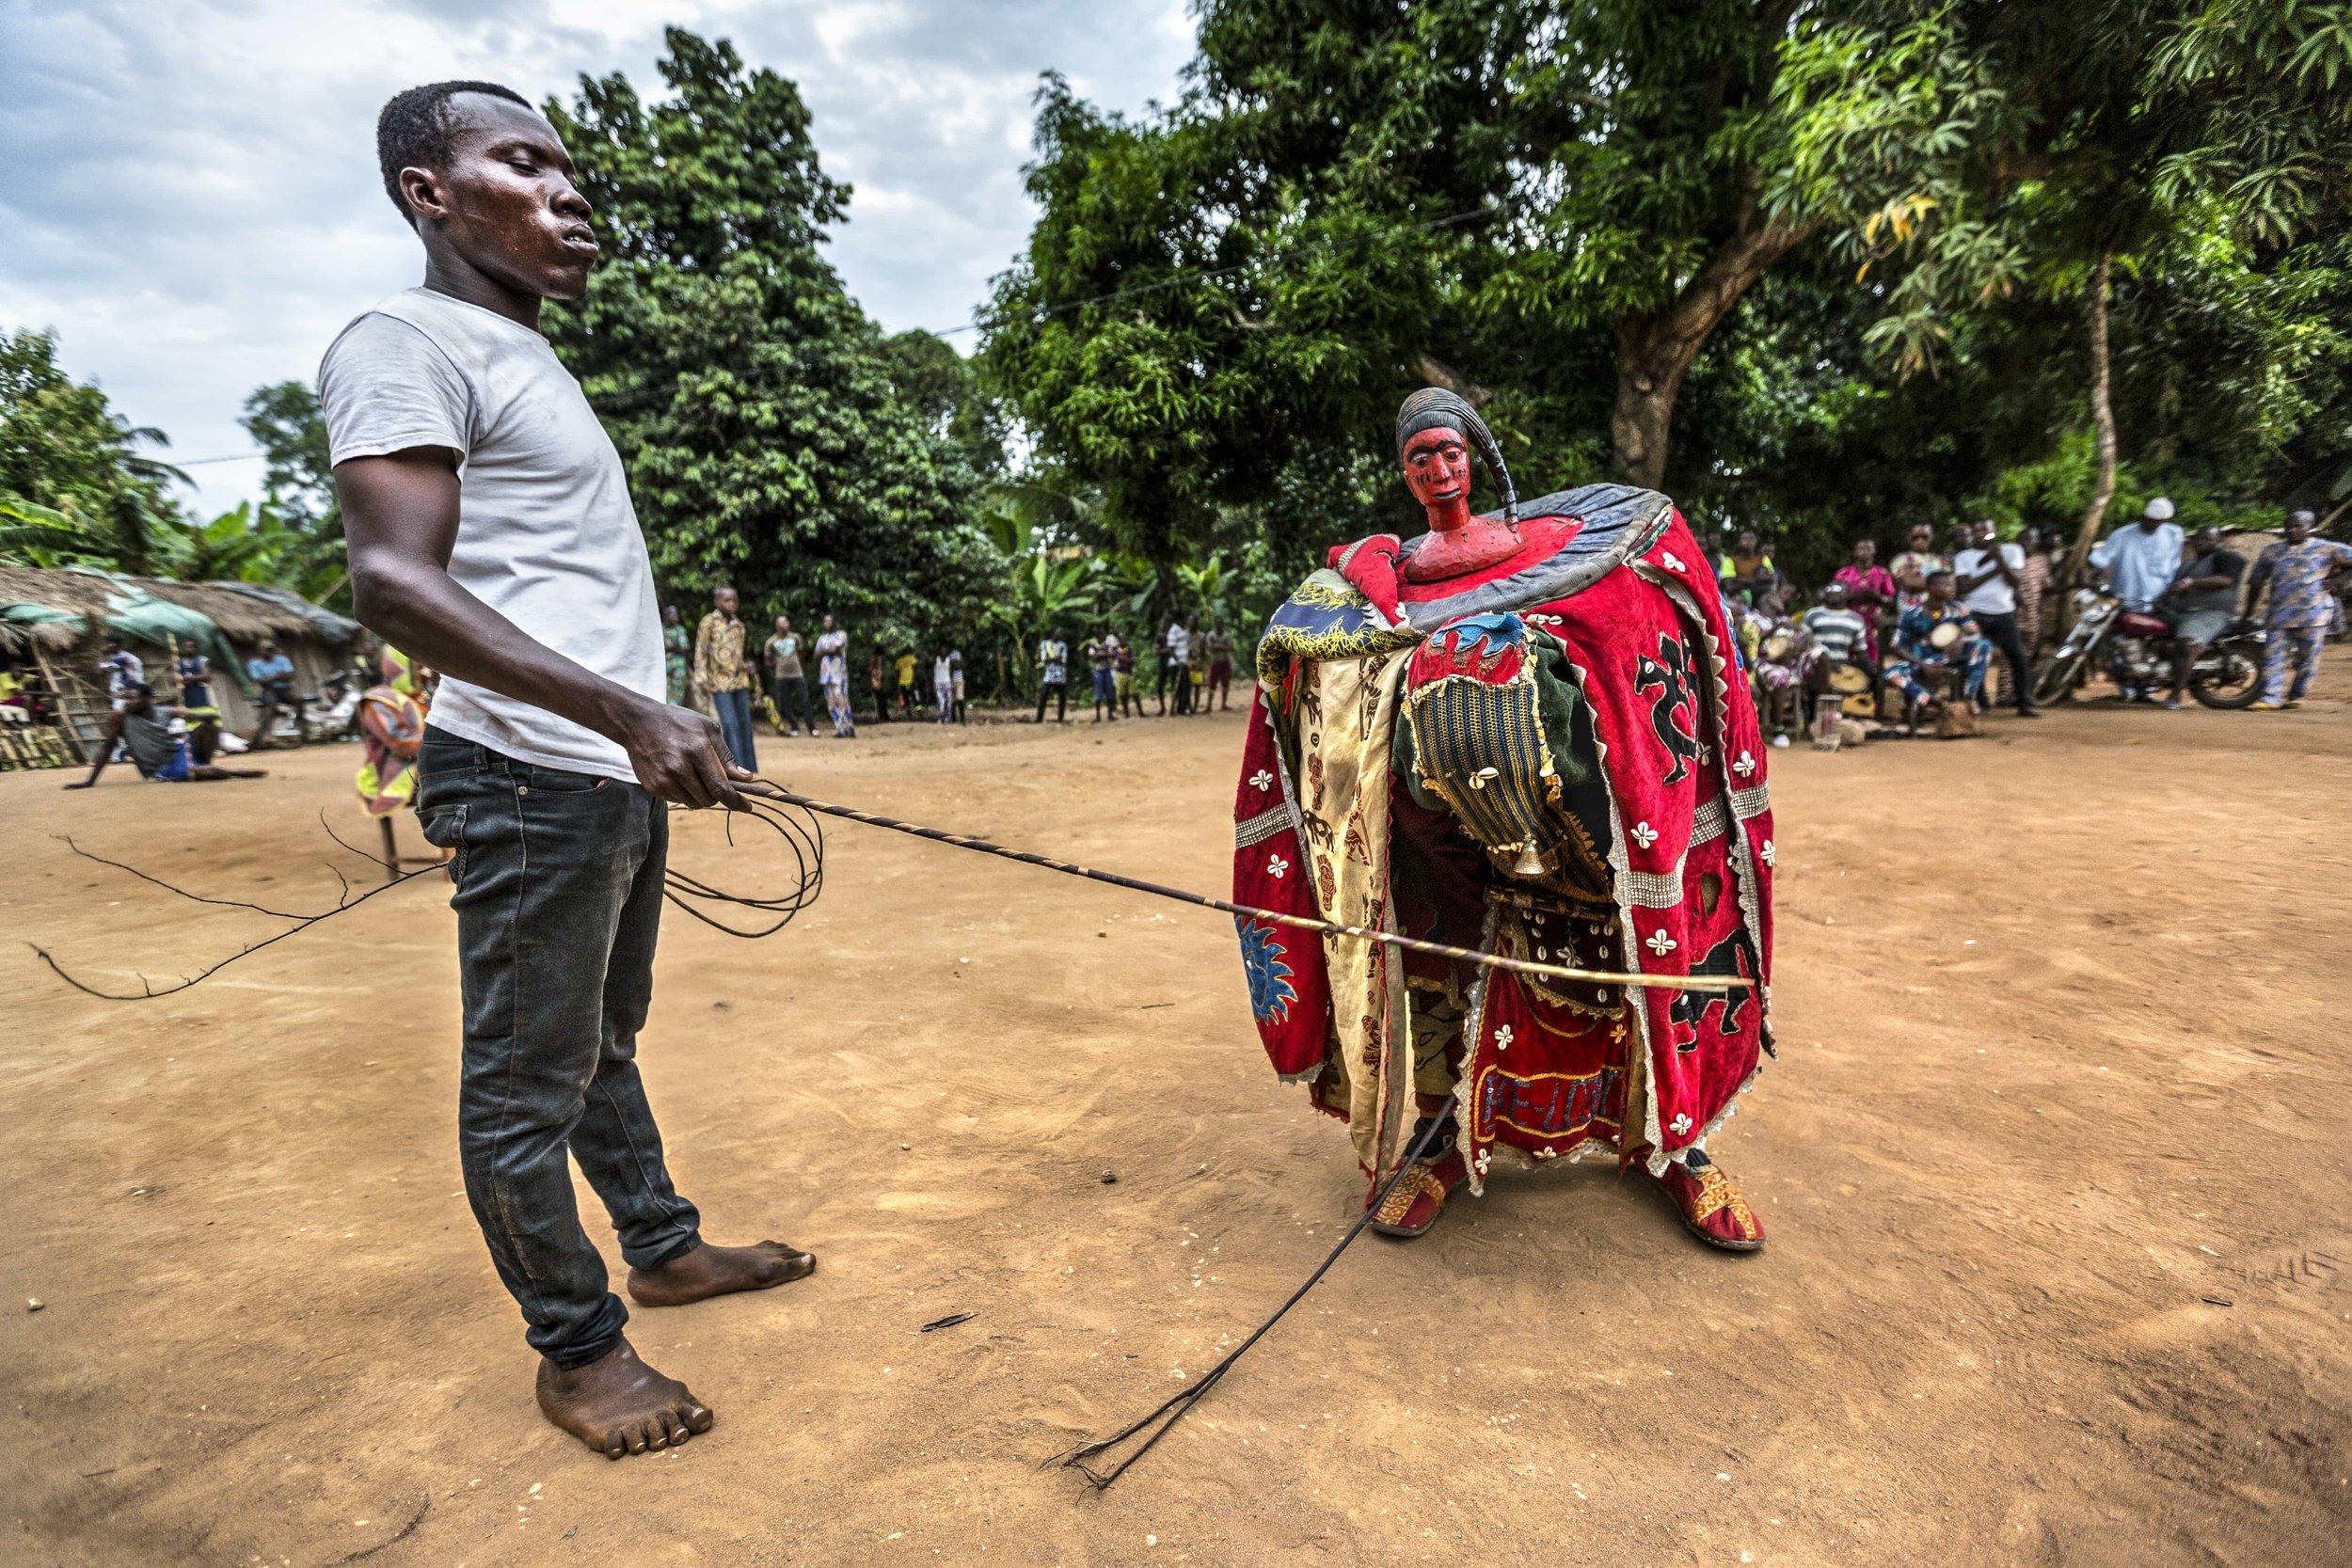 documentary-reportage-photography-voodoo-fabio-burrelli-8.jpg